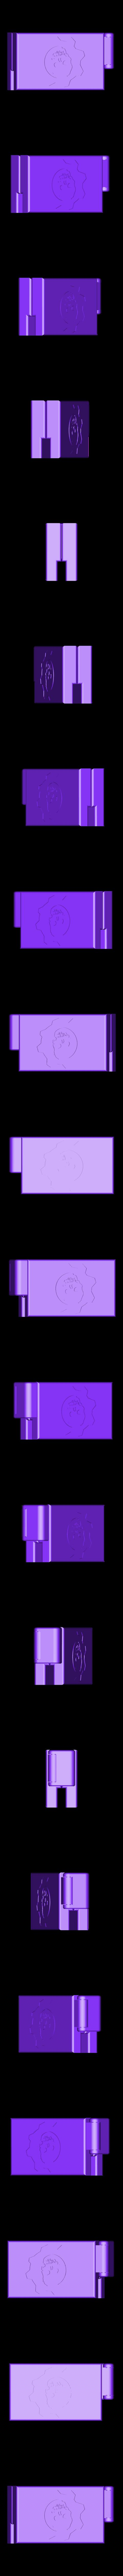 gowwallet.stl Download free STL file Video Game/Anime Themed Wallets • 3D print design, ChrisBobo